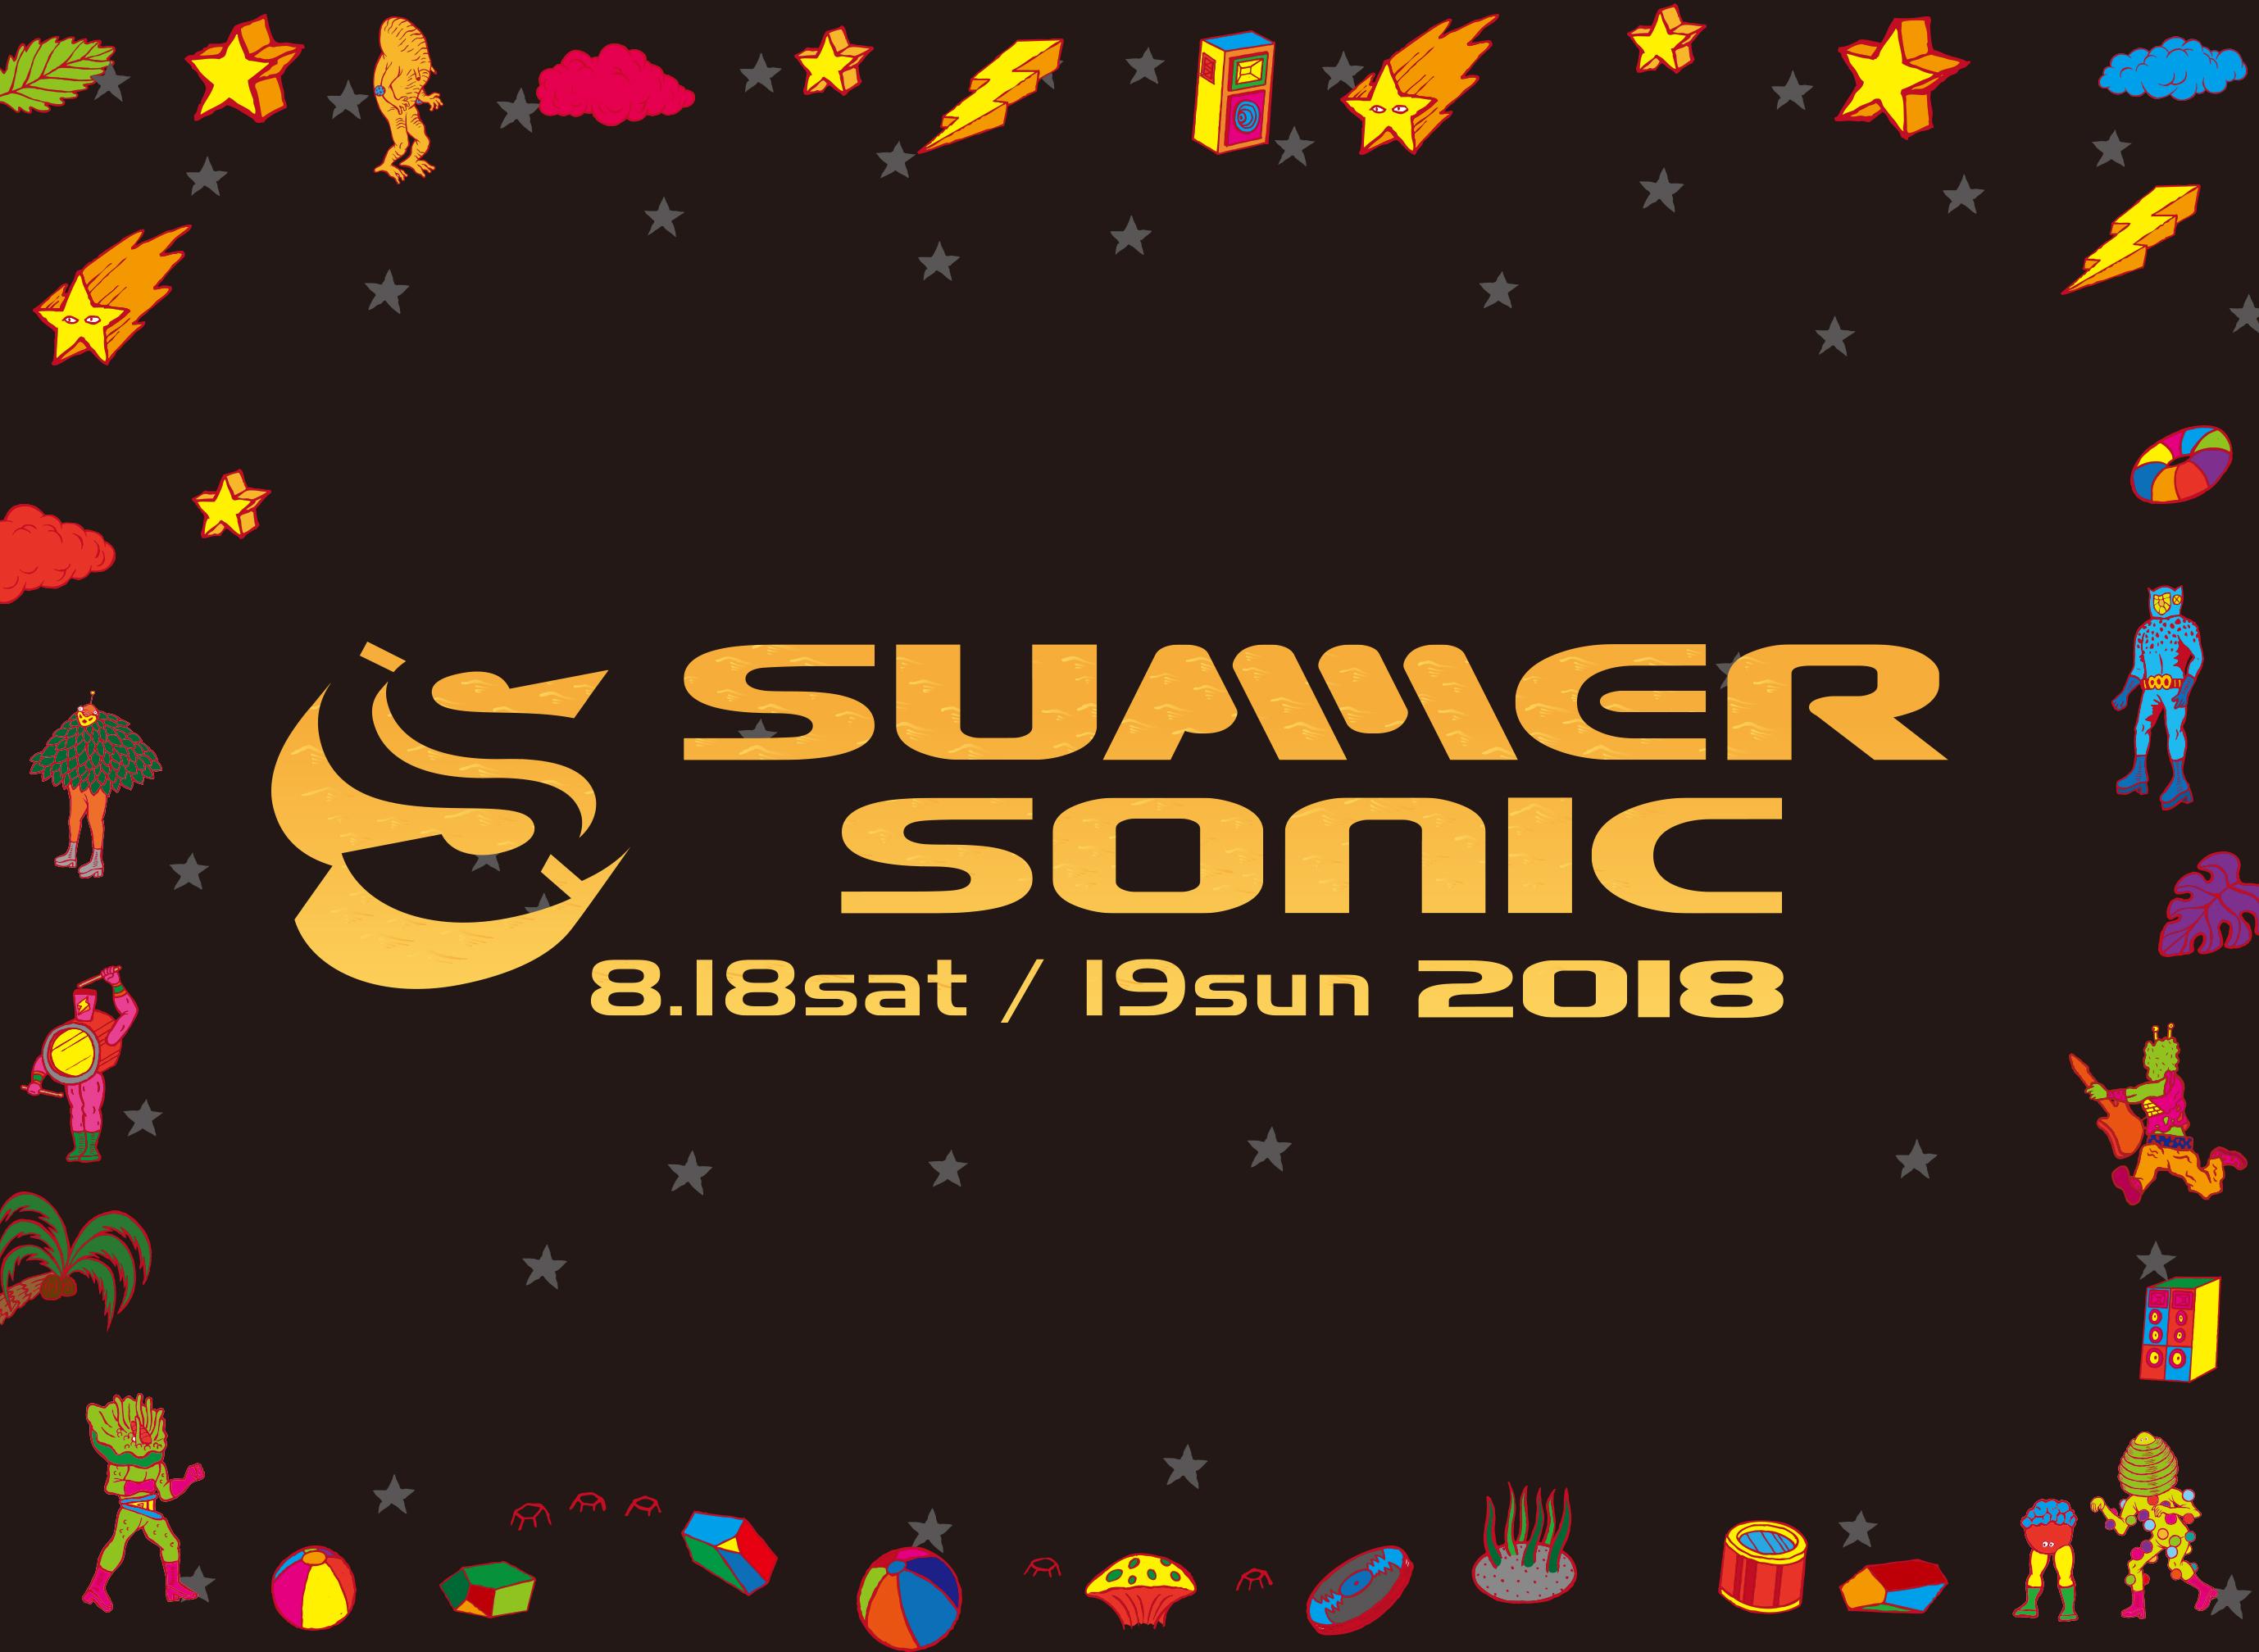 『SUMMER SONIC 2018』